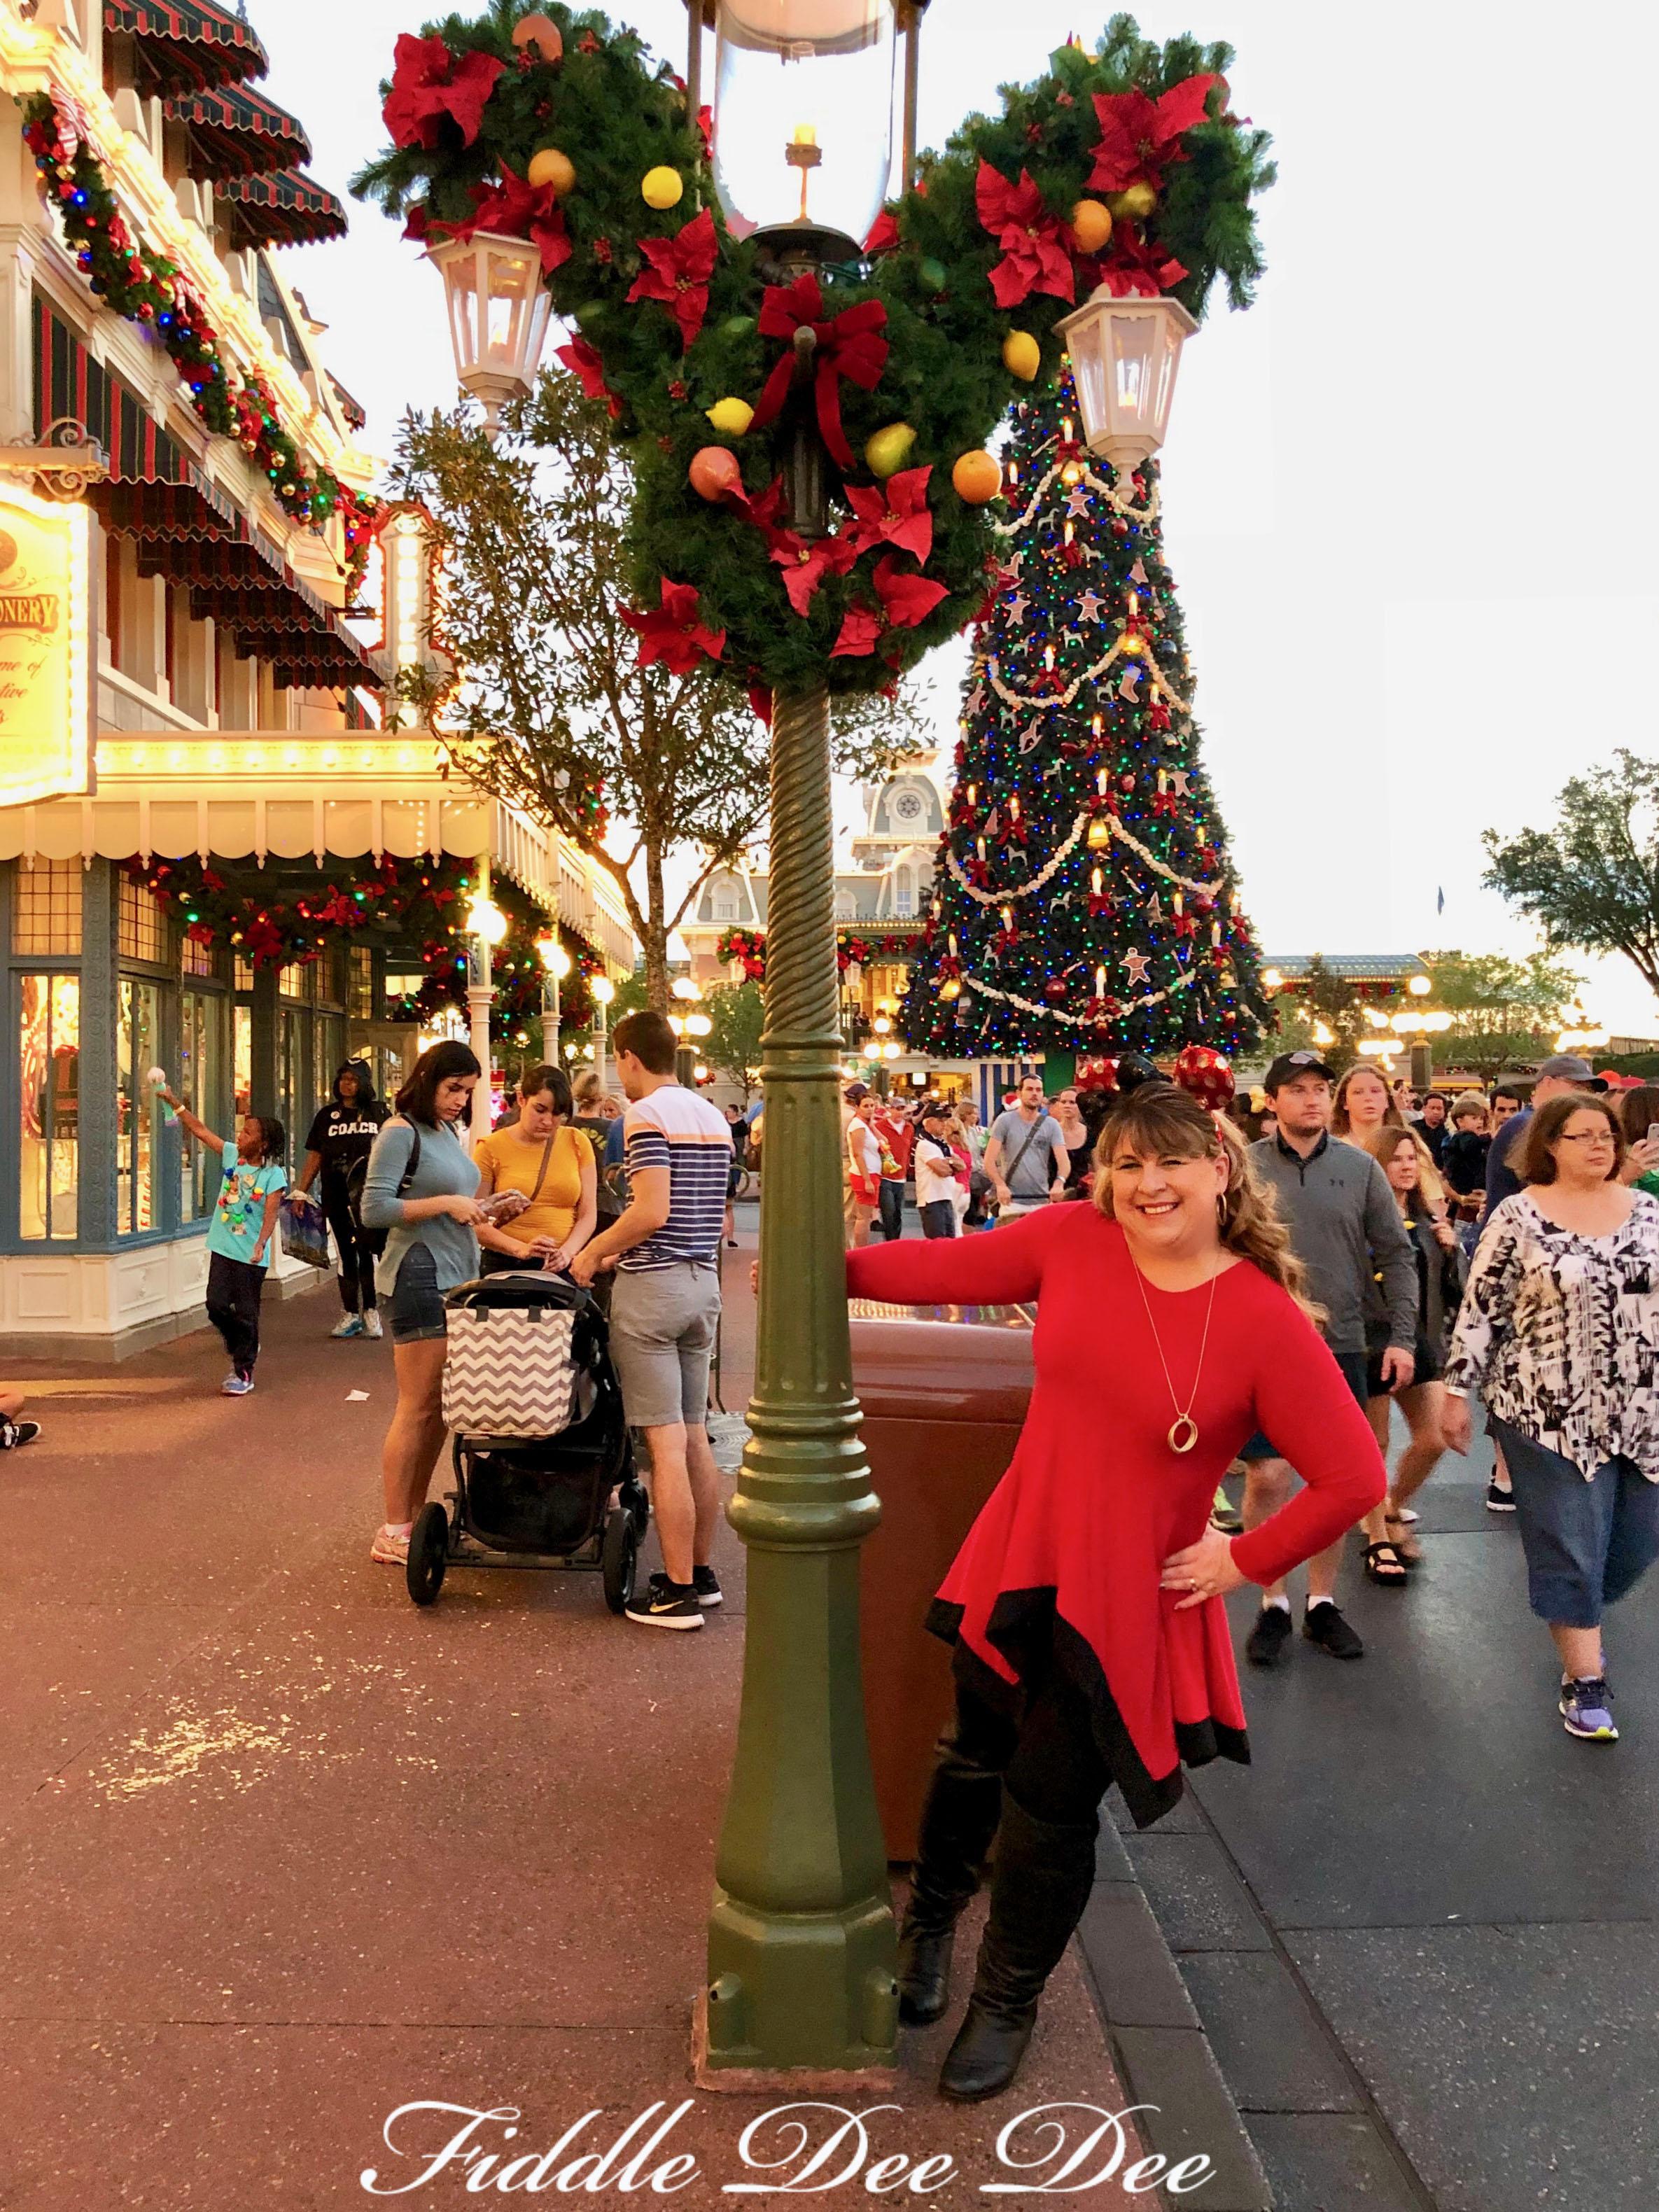 Disney-Christmas-Party-Celebration | Fiddle Dee Dee